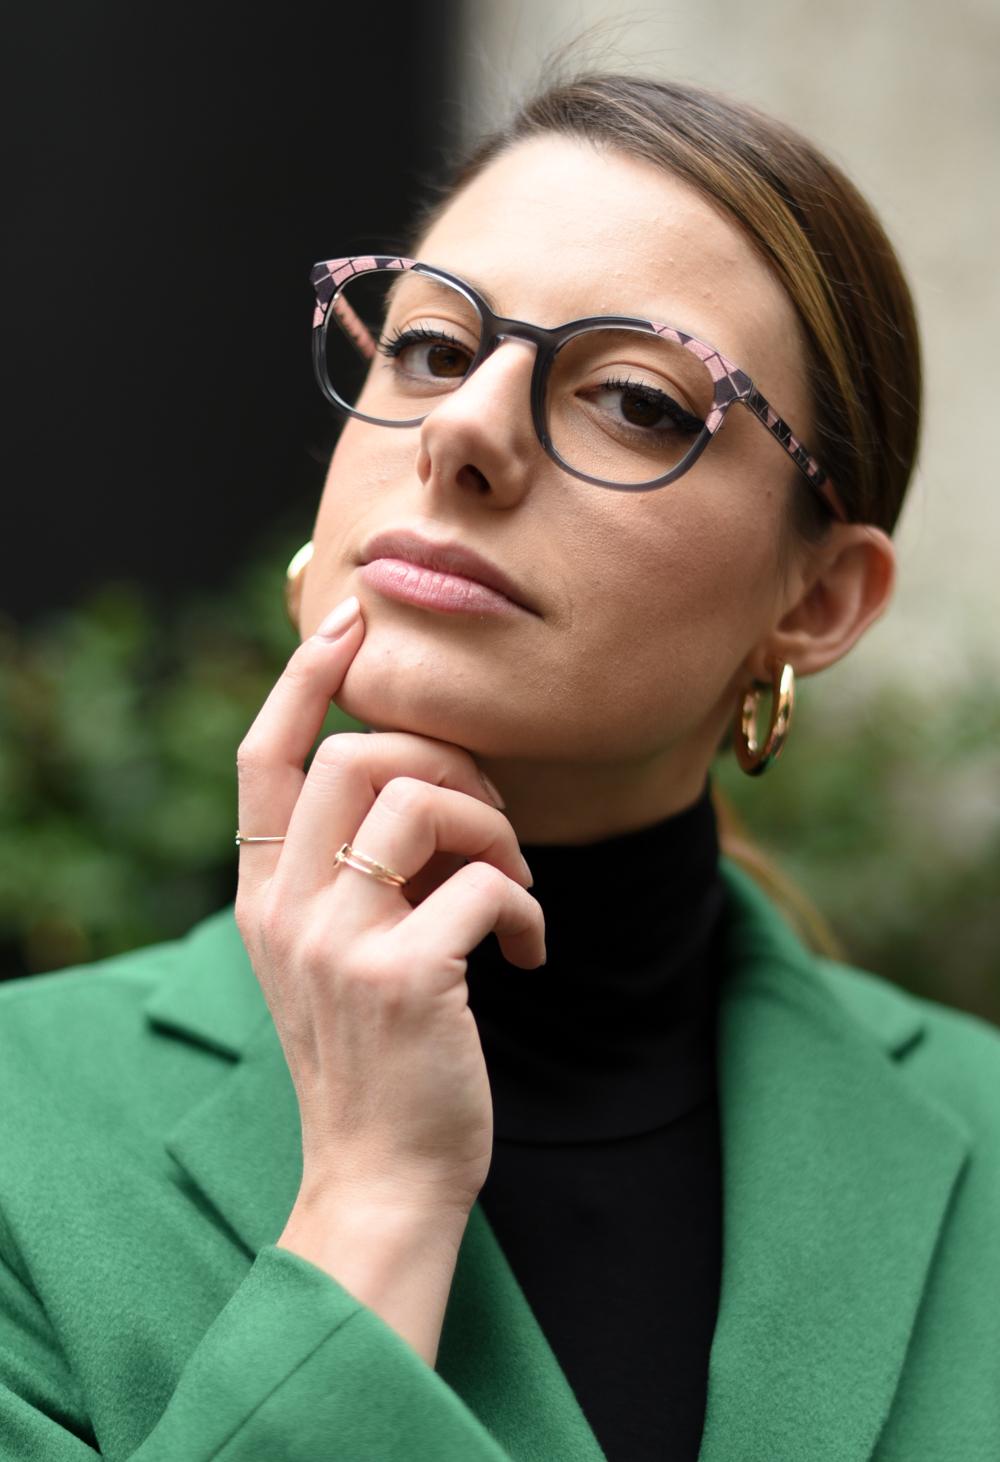 Giulia de martin behind my glasses eyewear blog influencer woow eyeglasses optical lunettes pink tartan wool paper 1 col 4012-7